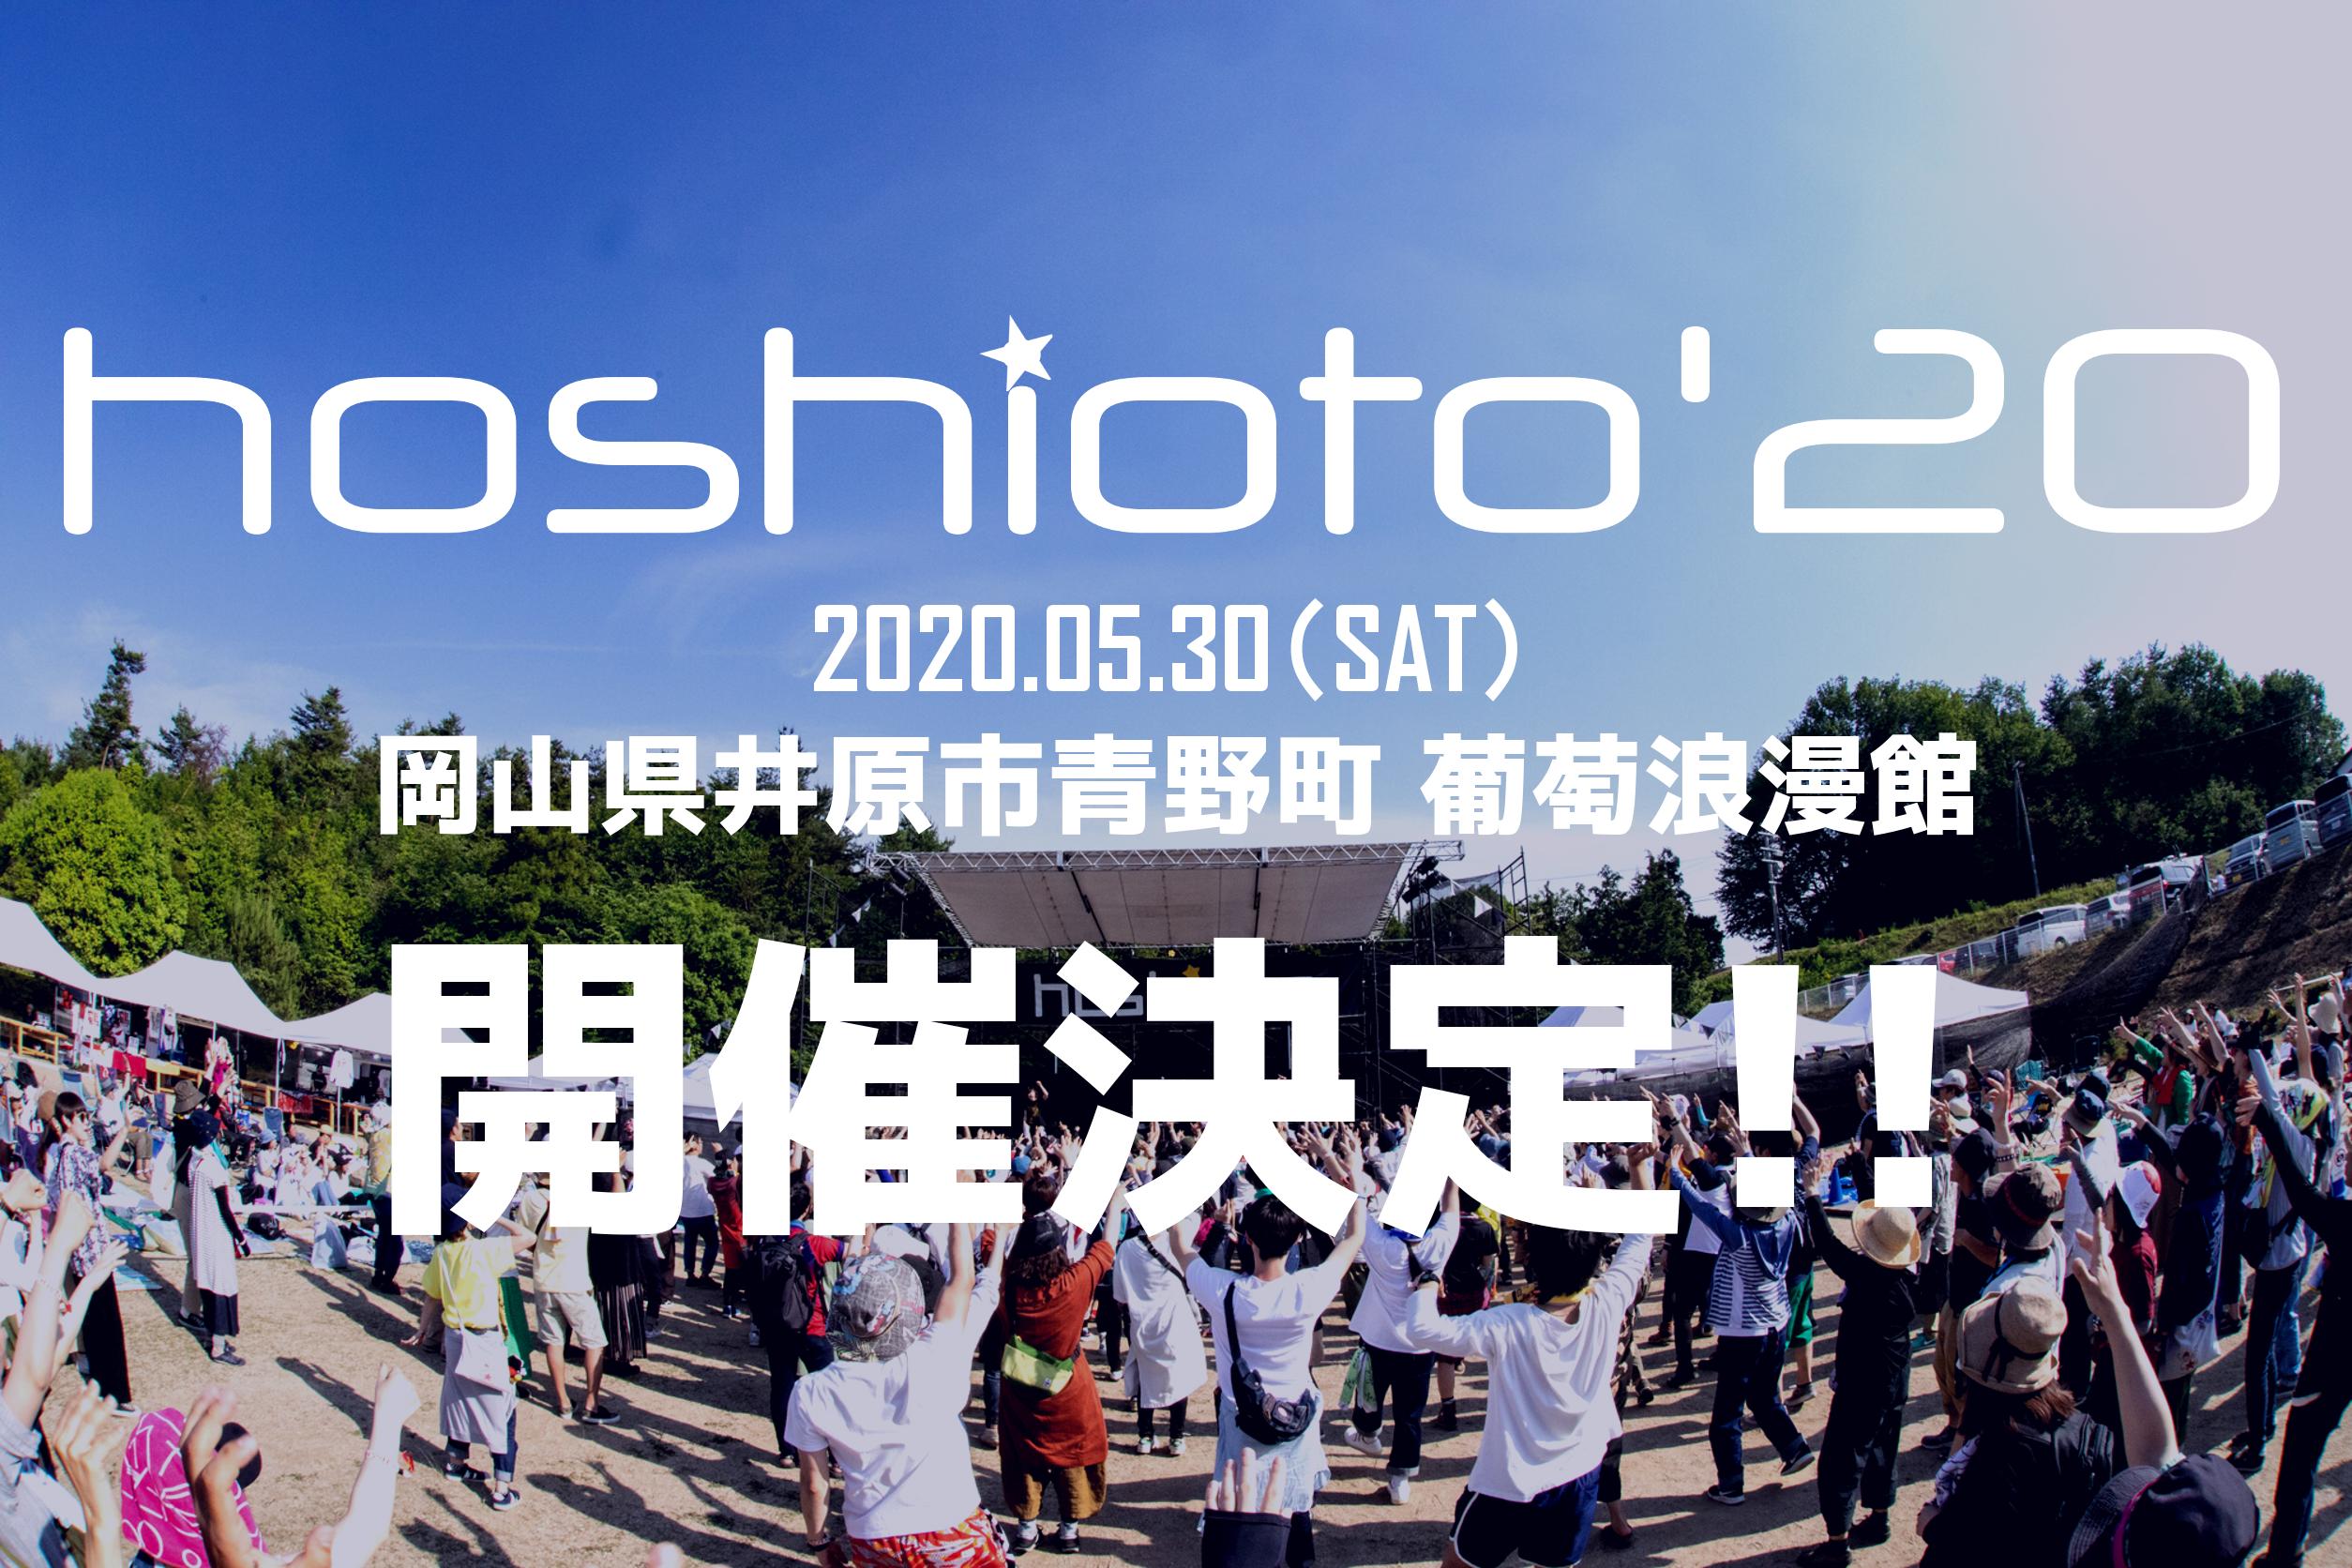 【hoshioto'20】今年も老若男女がより楽しめる充実した空間にしたい、開催応援キャンペーン